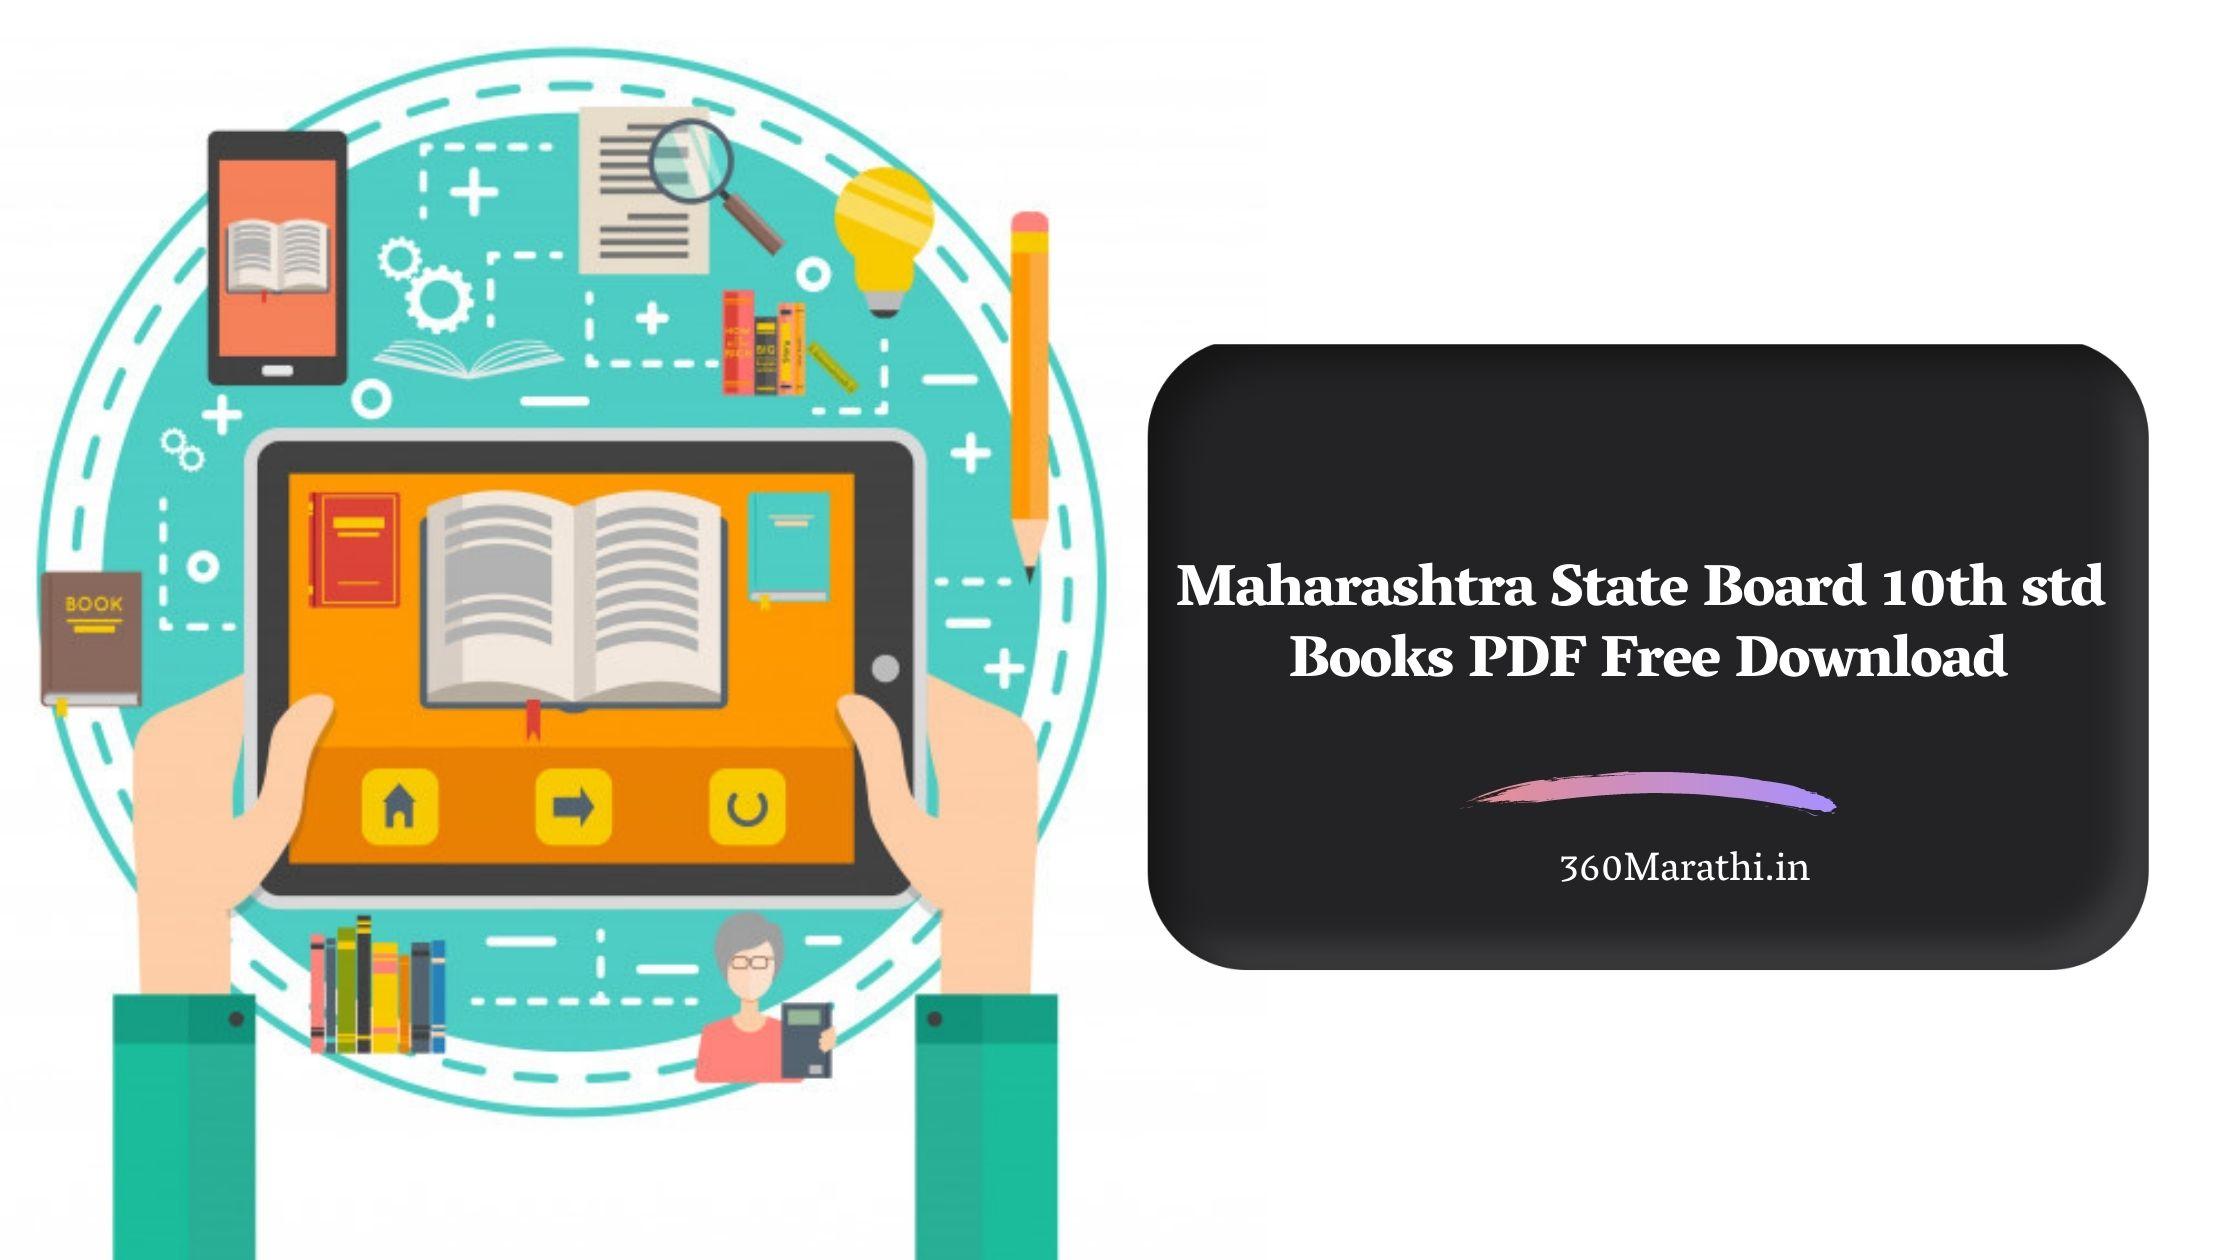 Maharashtra State Board 10th std Books PDF Free Download